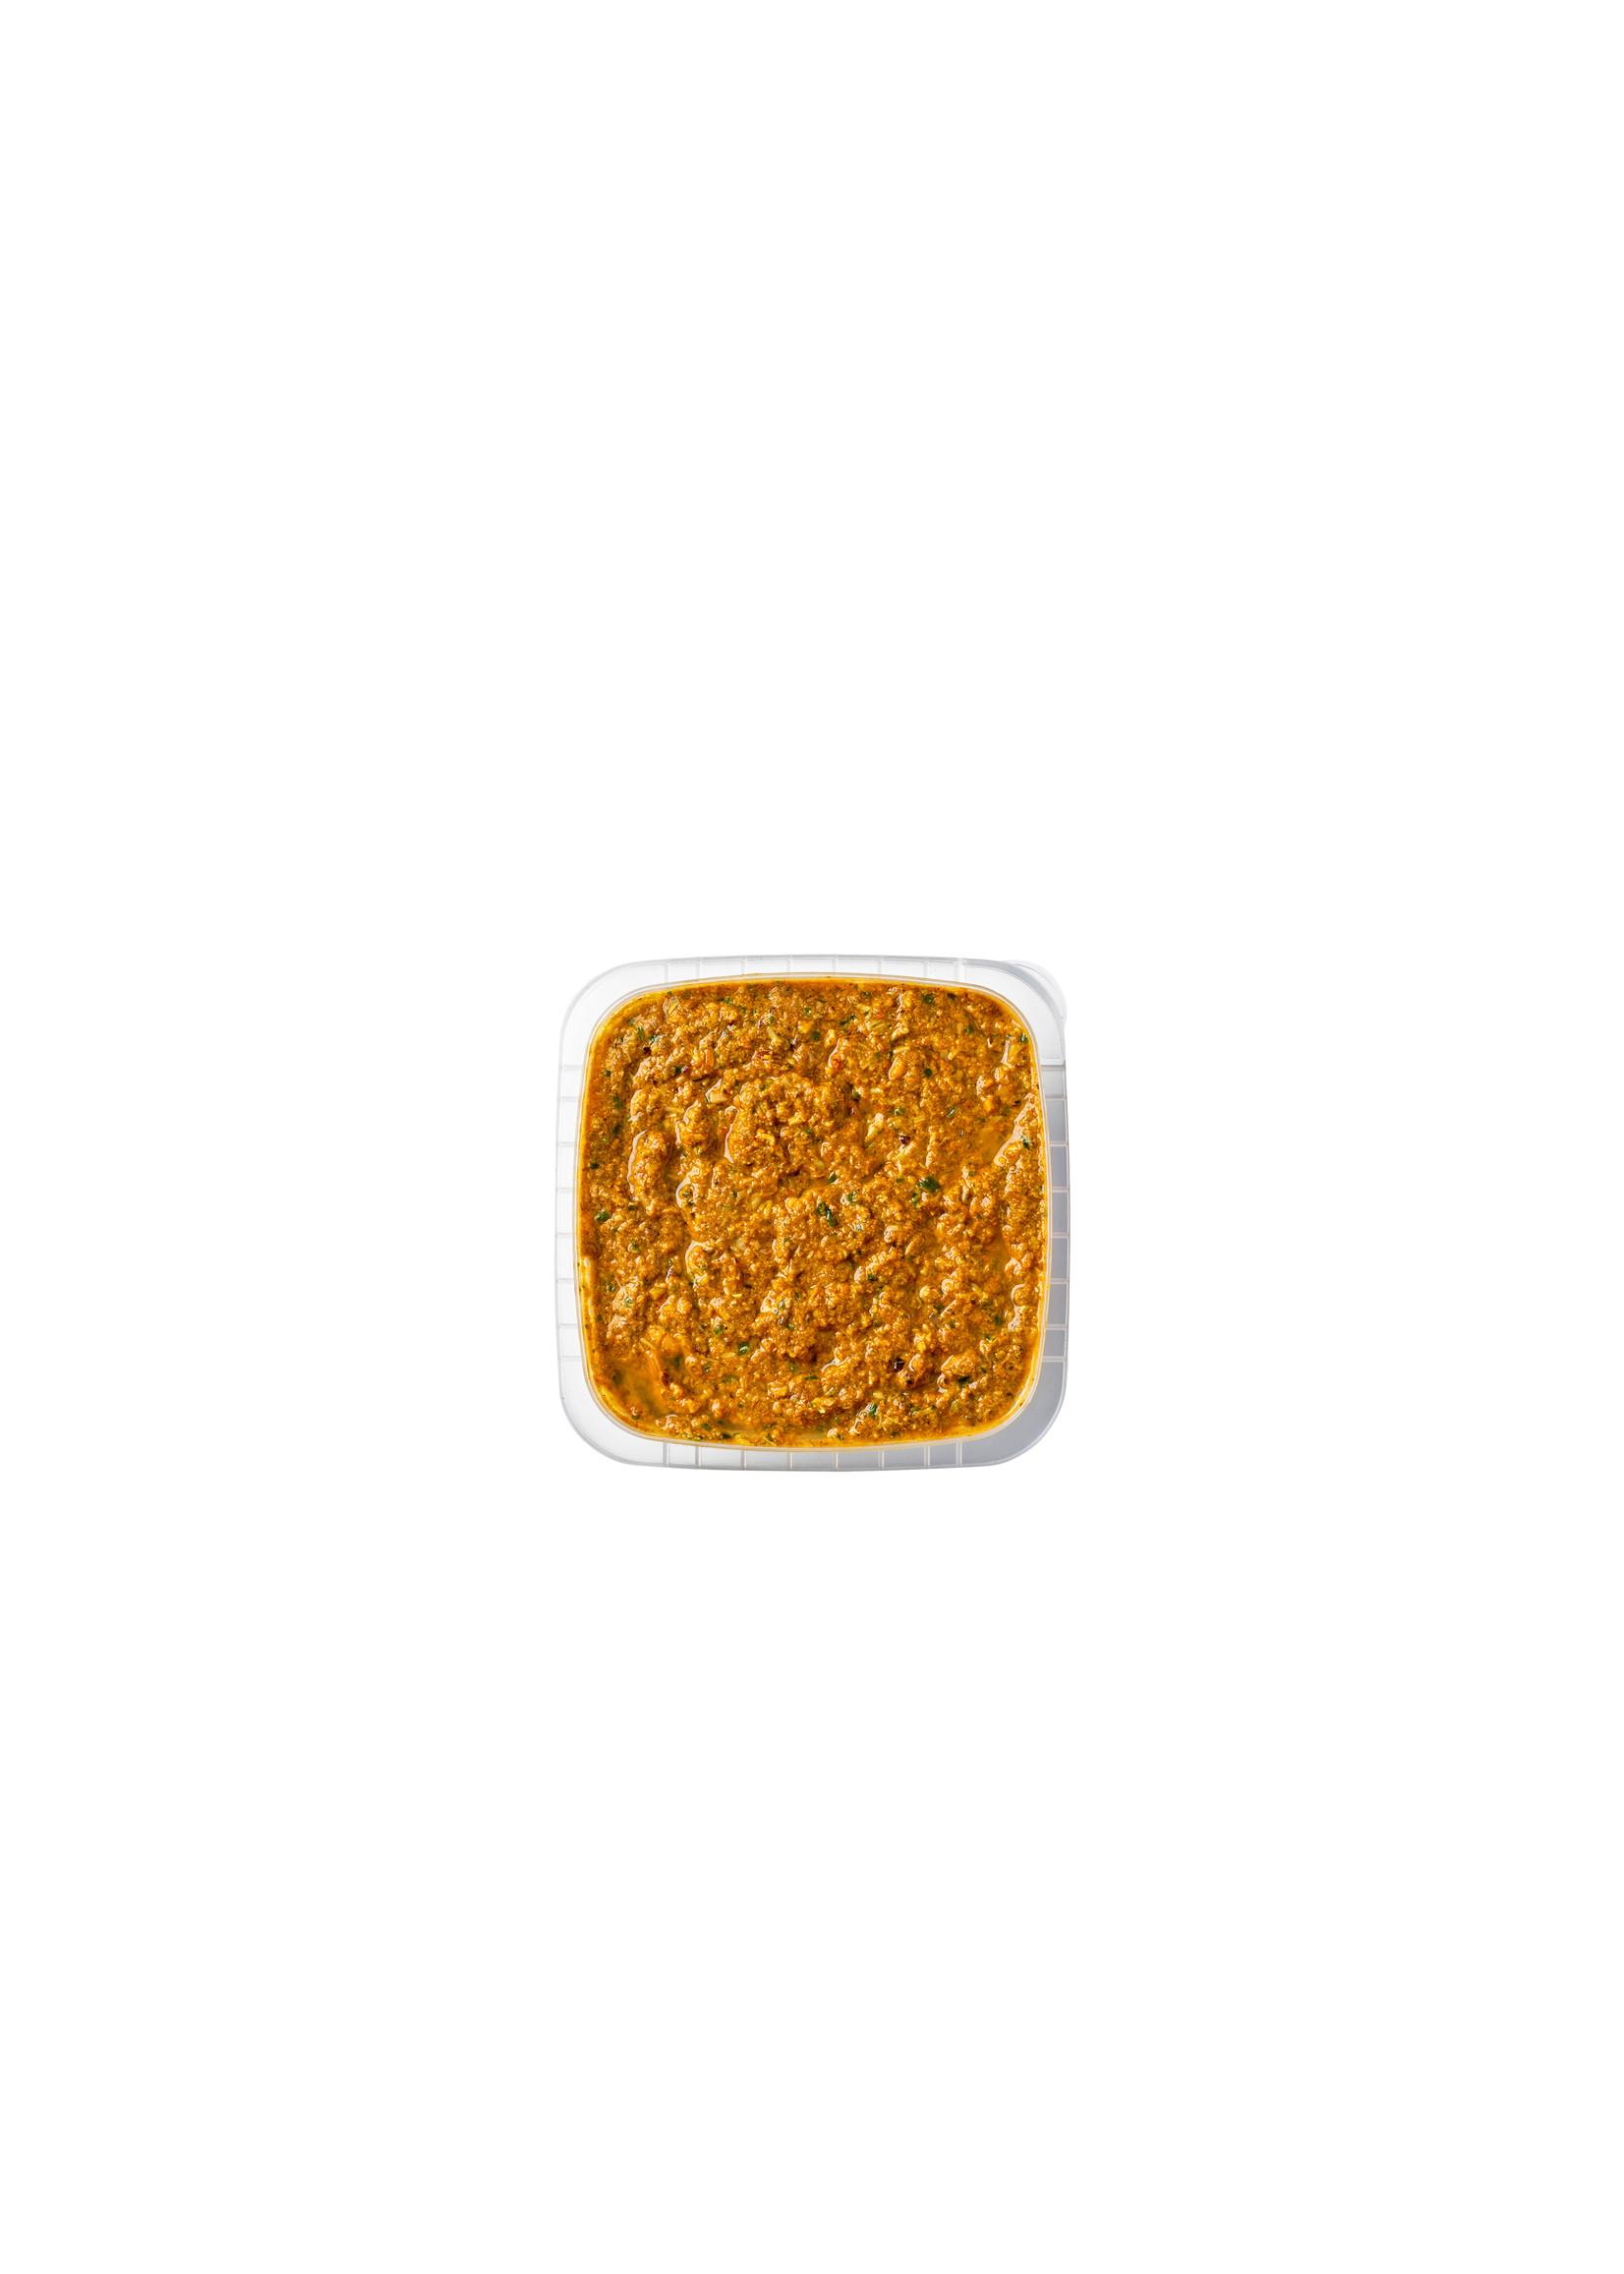 PRIMAL PET FOODS Primal Elixir Omega Mussels 16 oz.